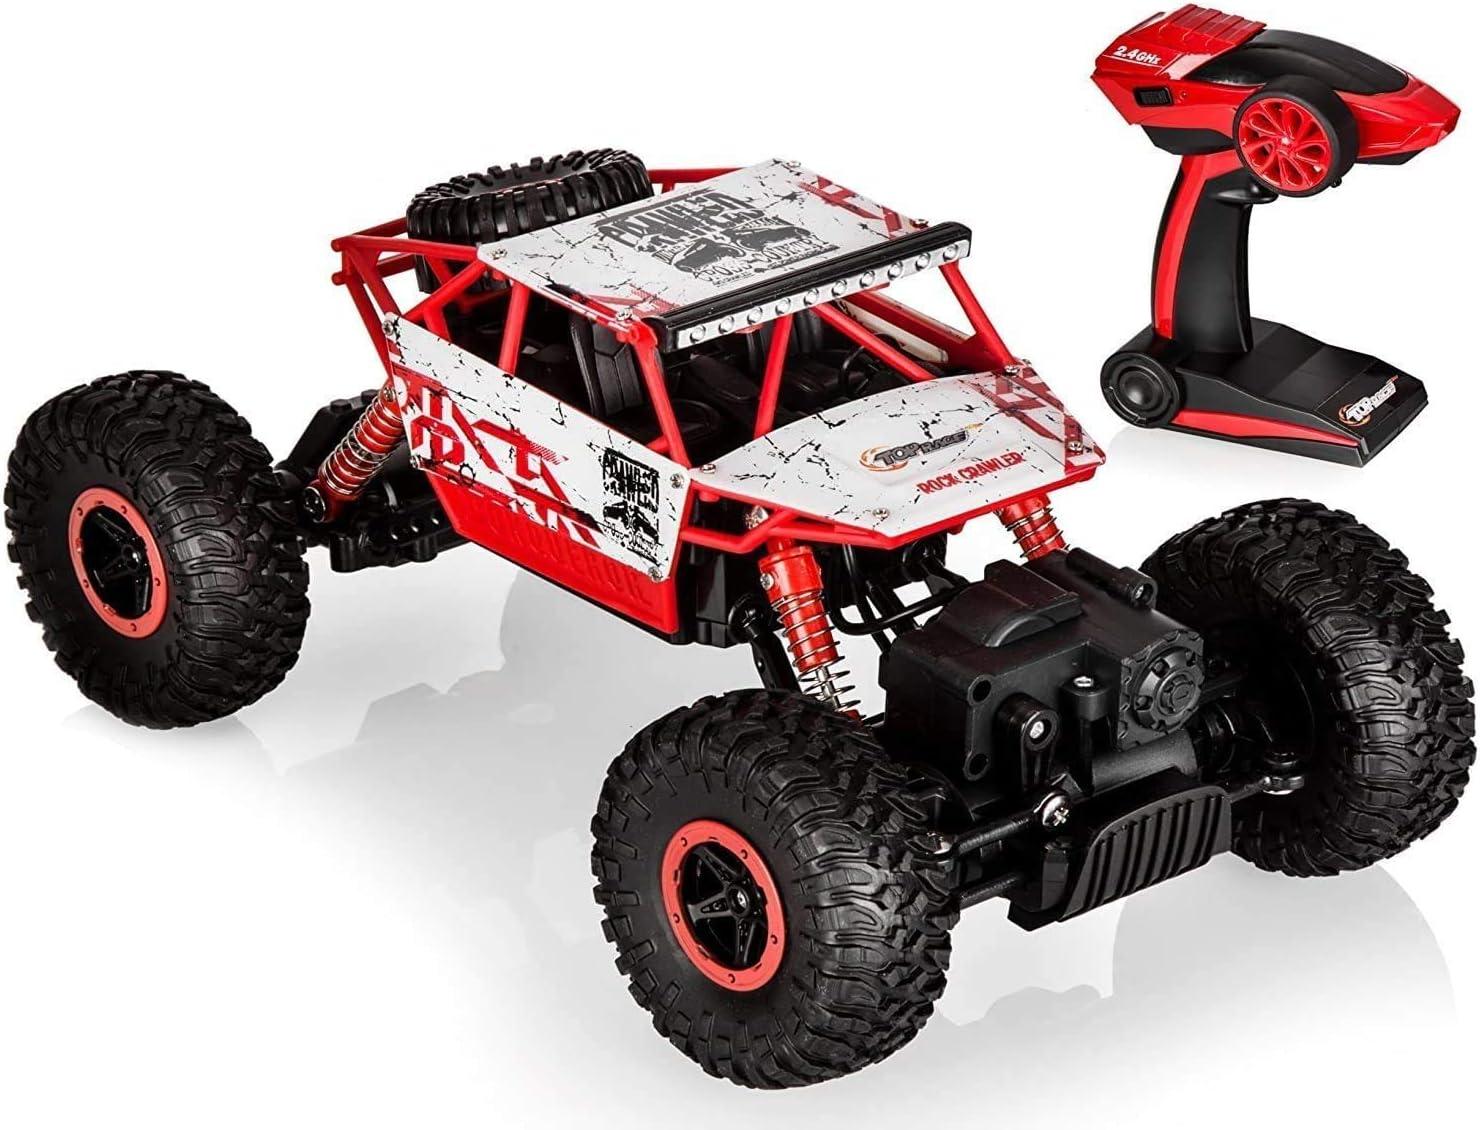 Top Race Coche teledirigido RC 4x4 Monster Truck | Juguete de Control Remoto 2.4Ghz| 4WD Buggy Race Crawler Coches teledirigidos | Juguetes para niños Adulto TR-130 (Rojo)